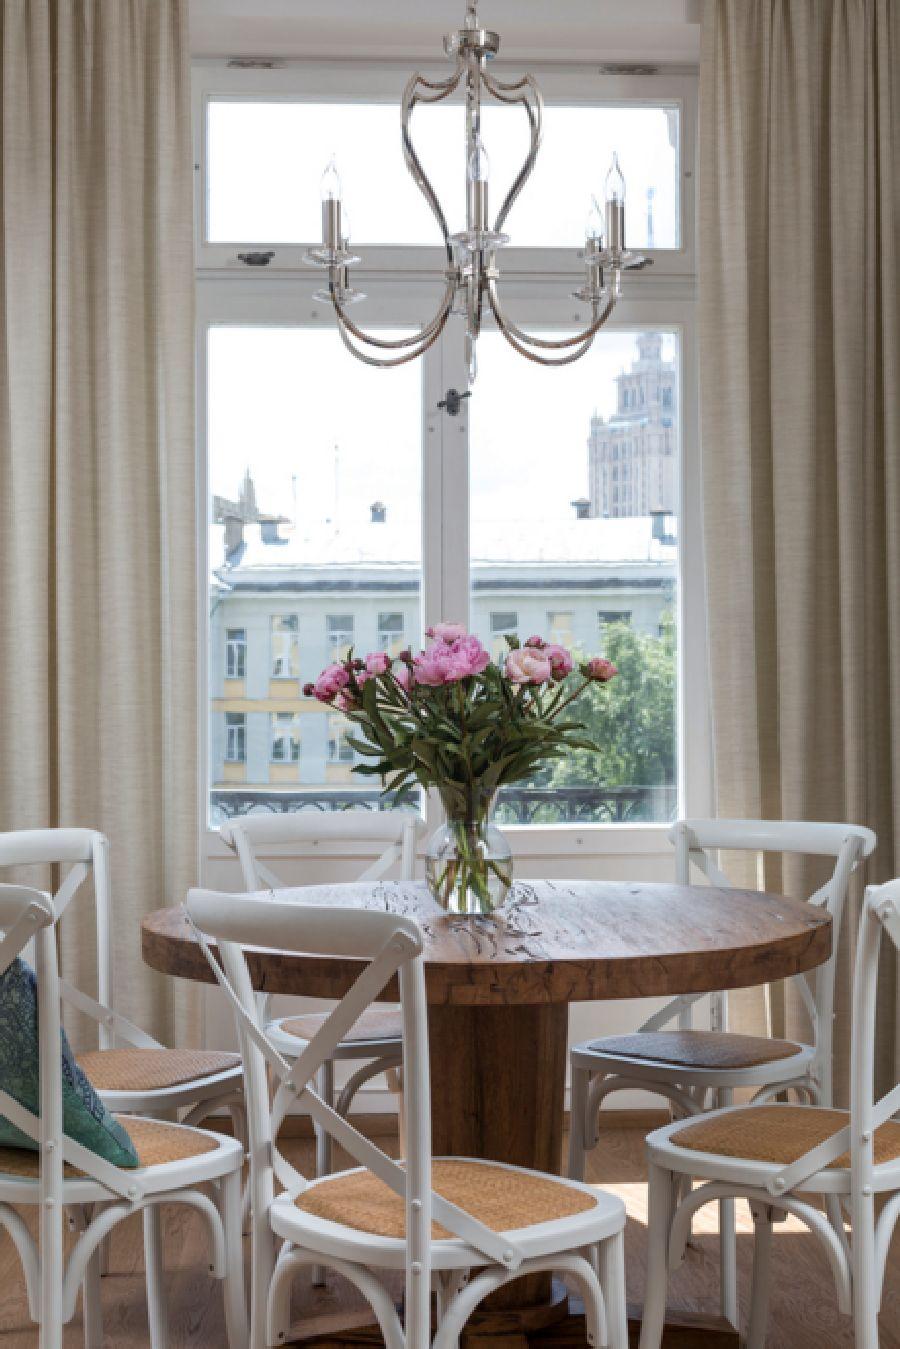 adelaparvu.com despre apartament de 80 mp patrati cu aer rustic elegant, locuinta Rusia, designer Zhenya Zhdanova (3)